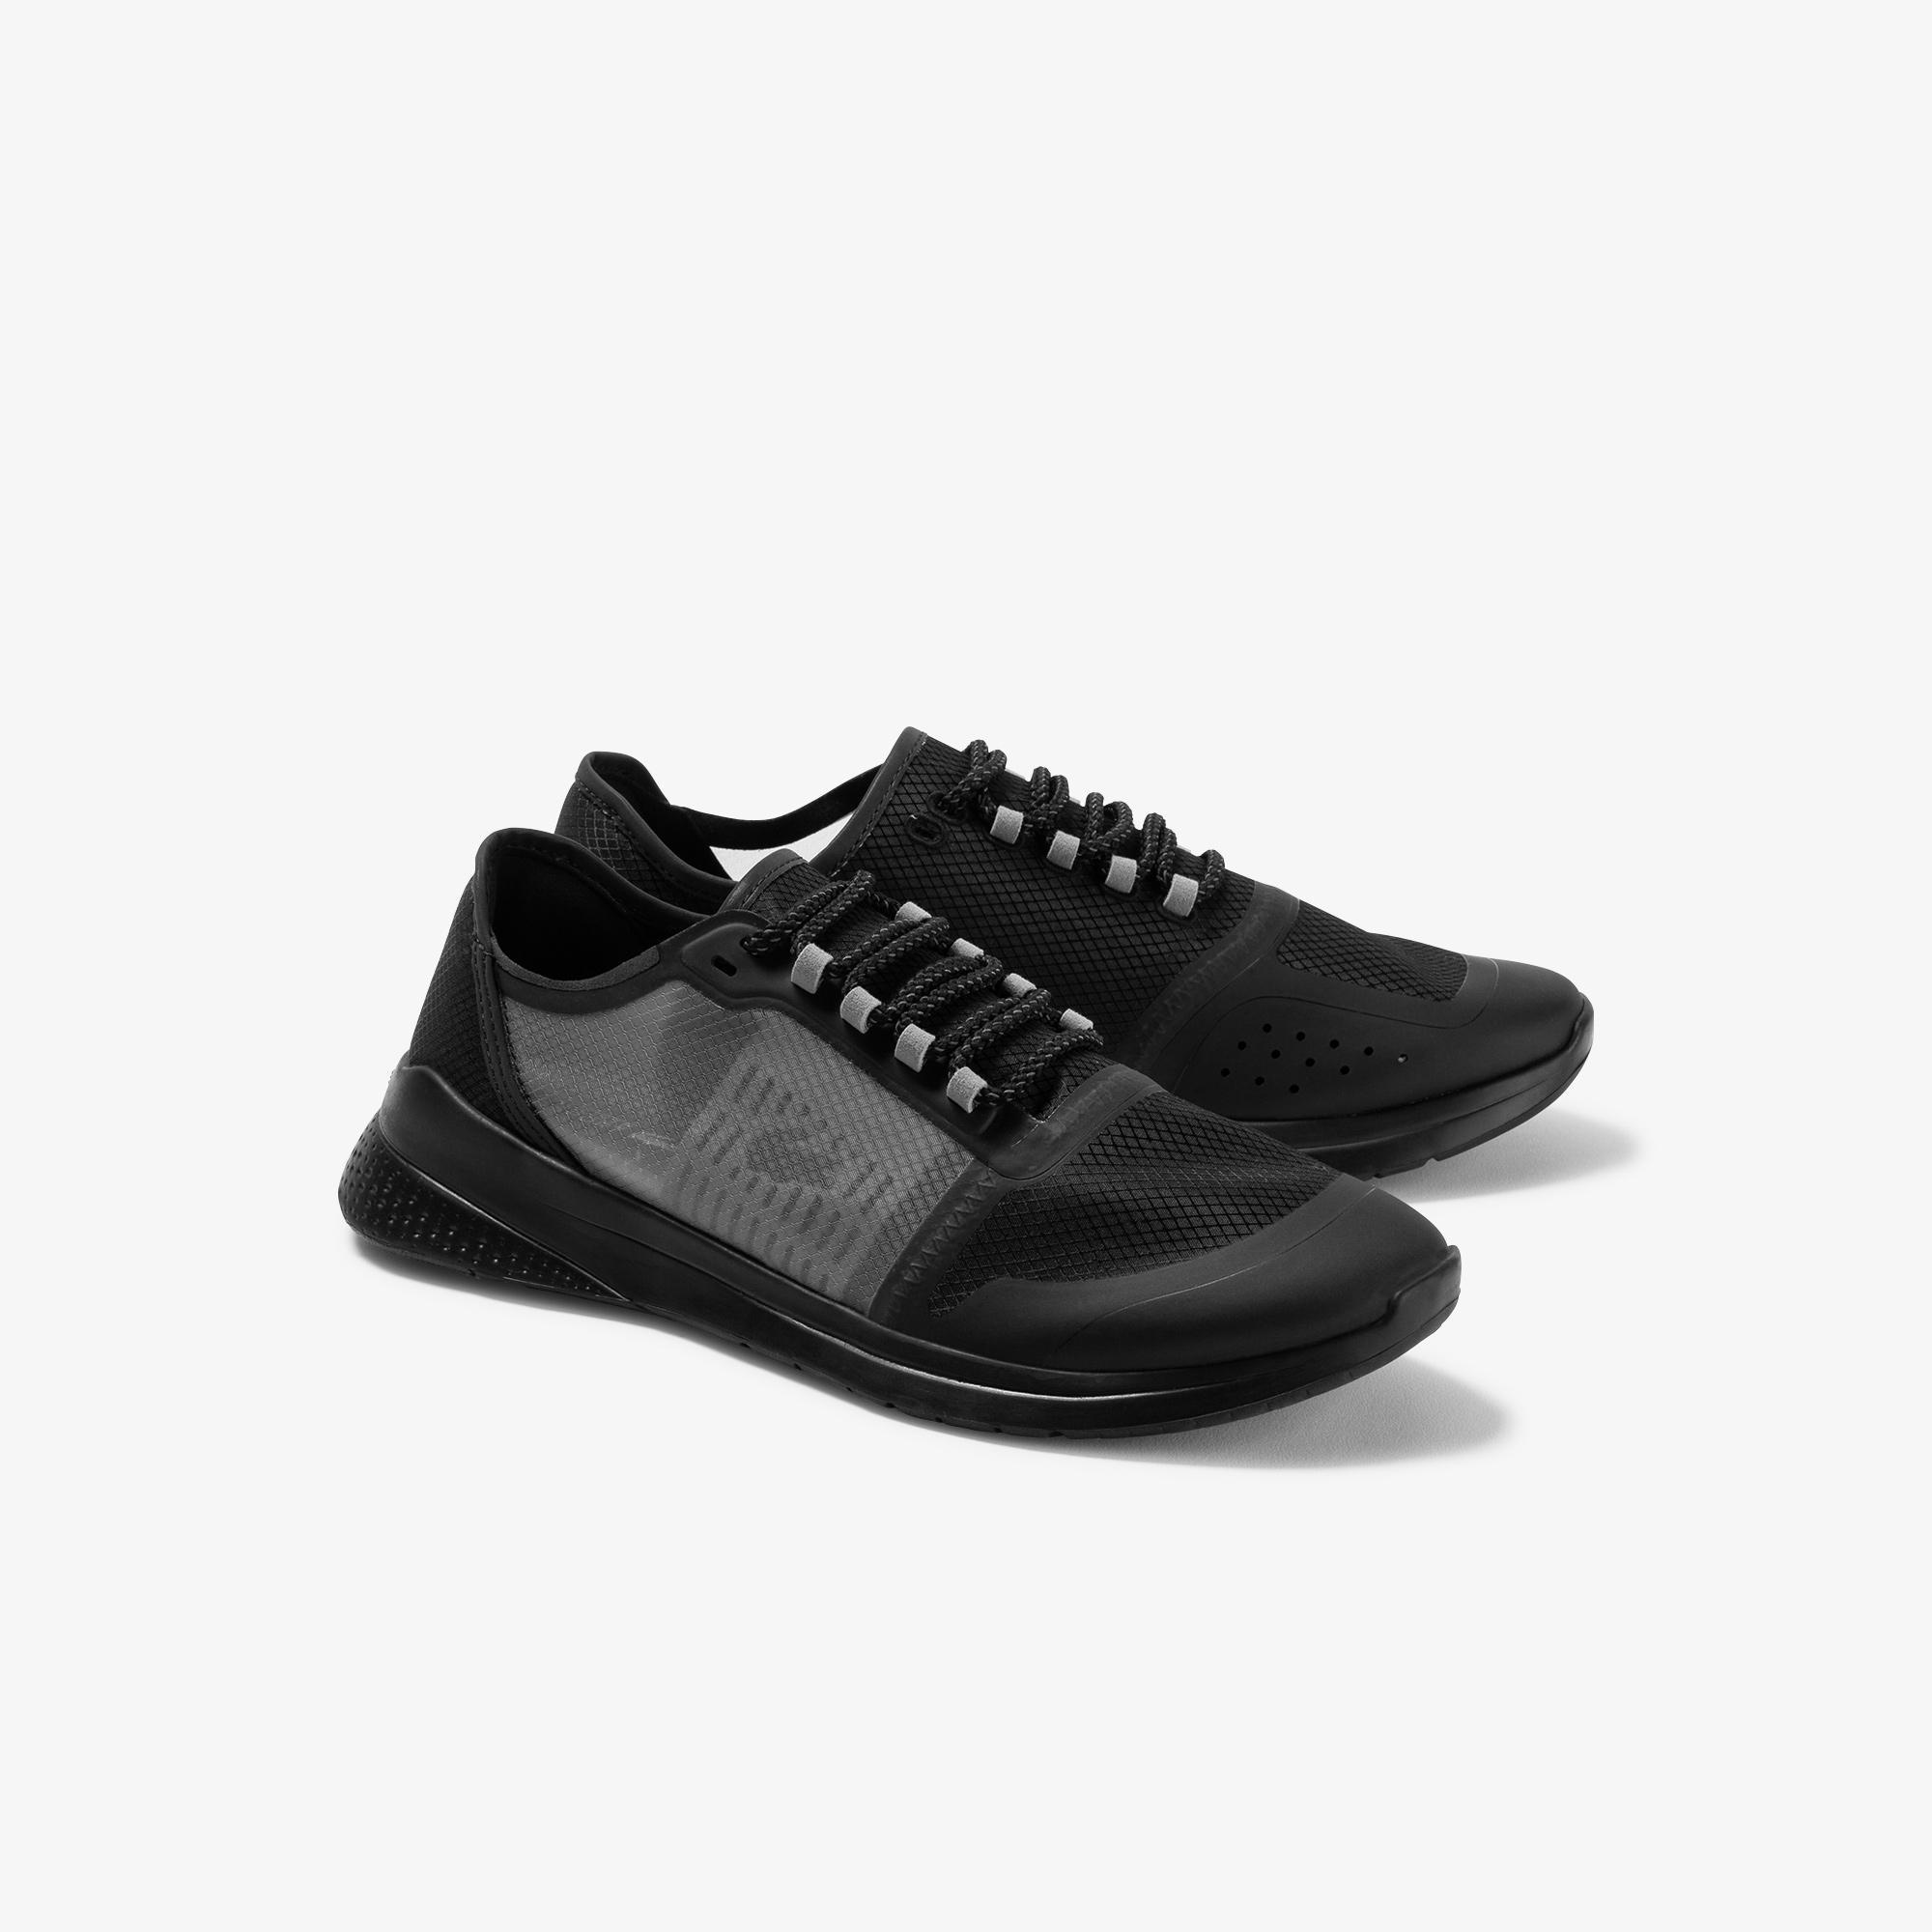 Lacoste Lt Fit 120 1 Sma Erkek Siyah - Gri Ayakkabı